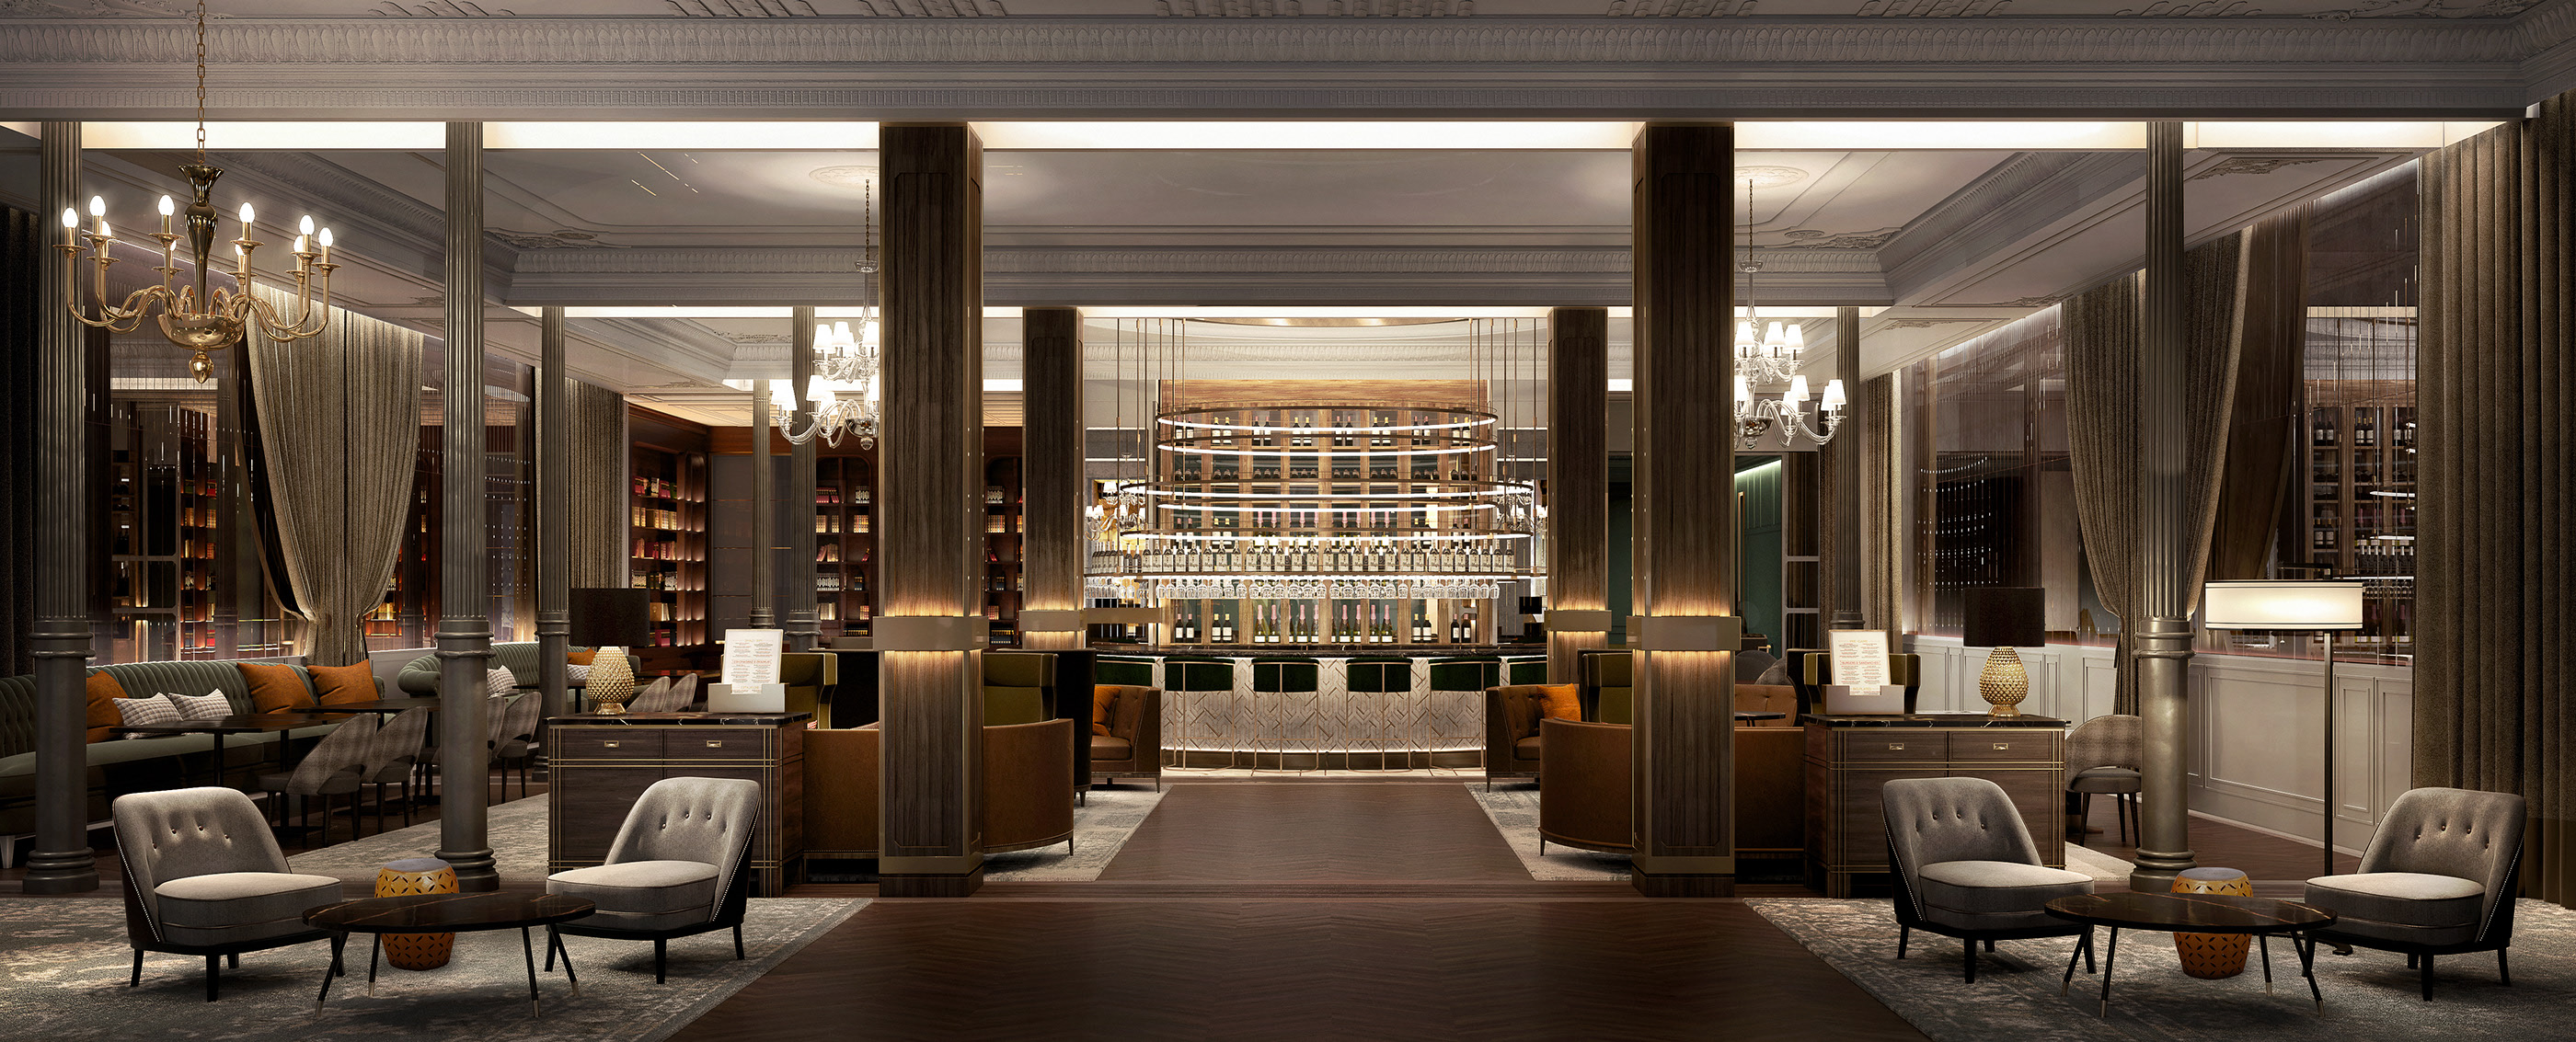 cafe architectural render